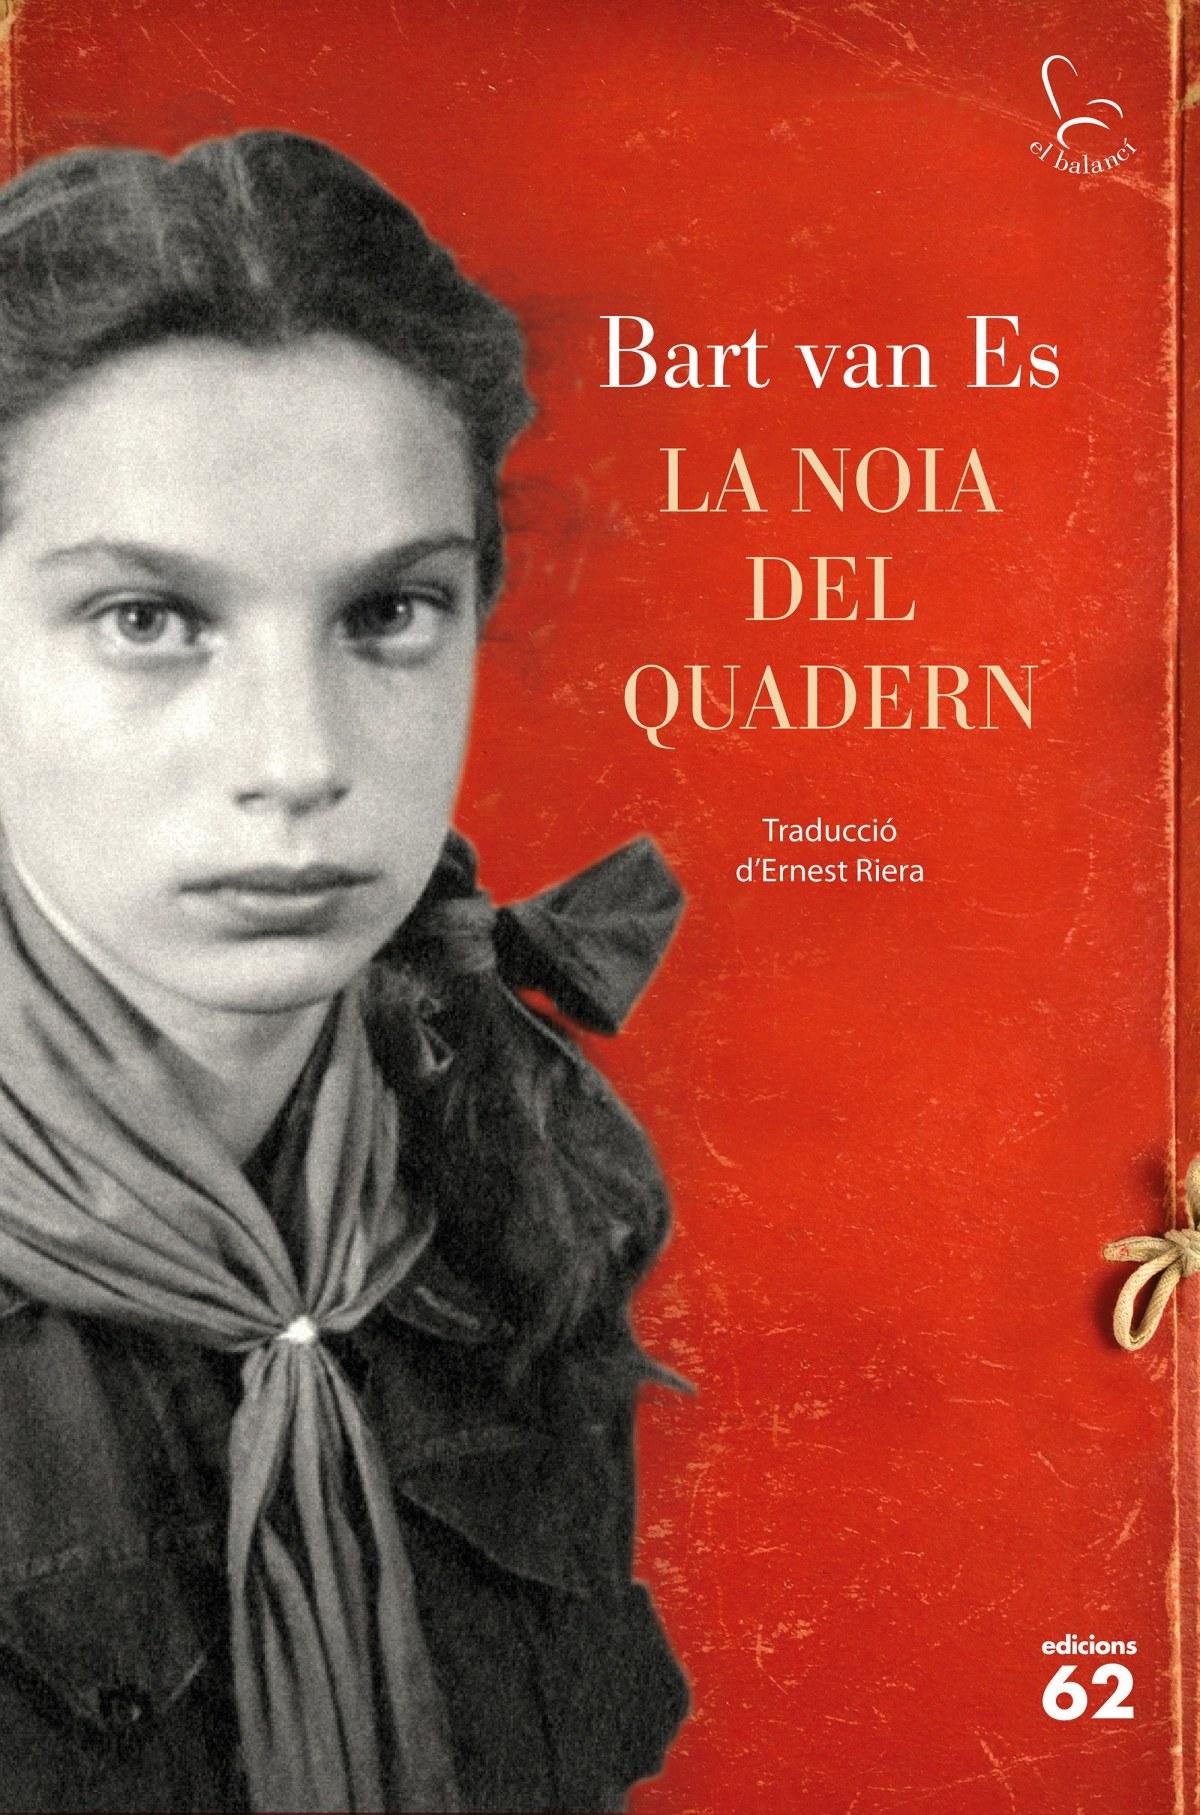 La noia del quadern